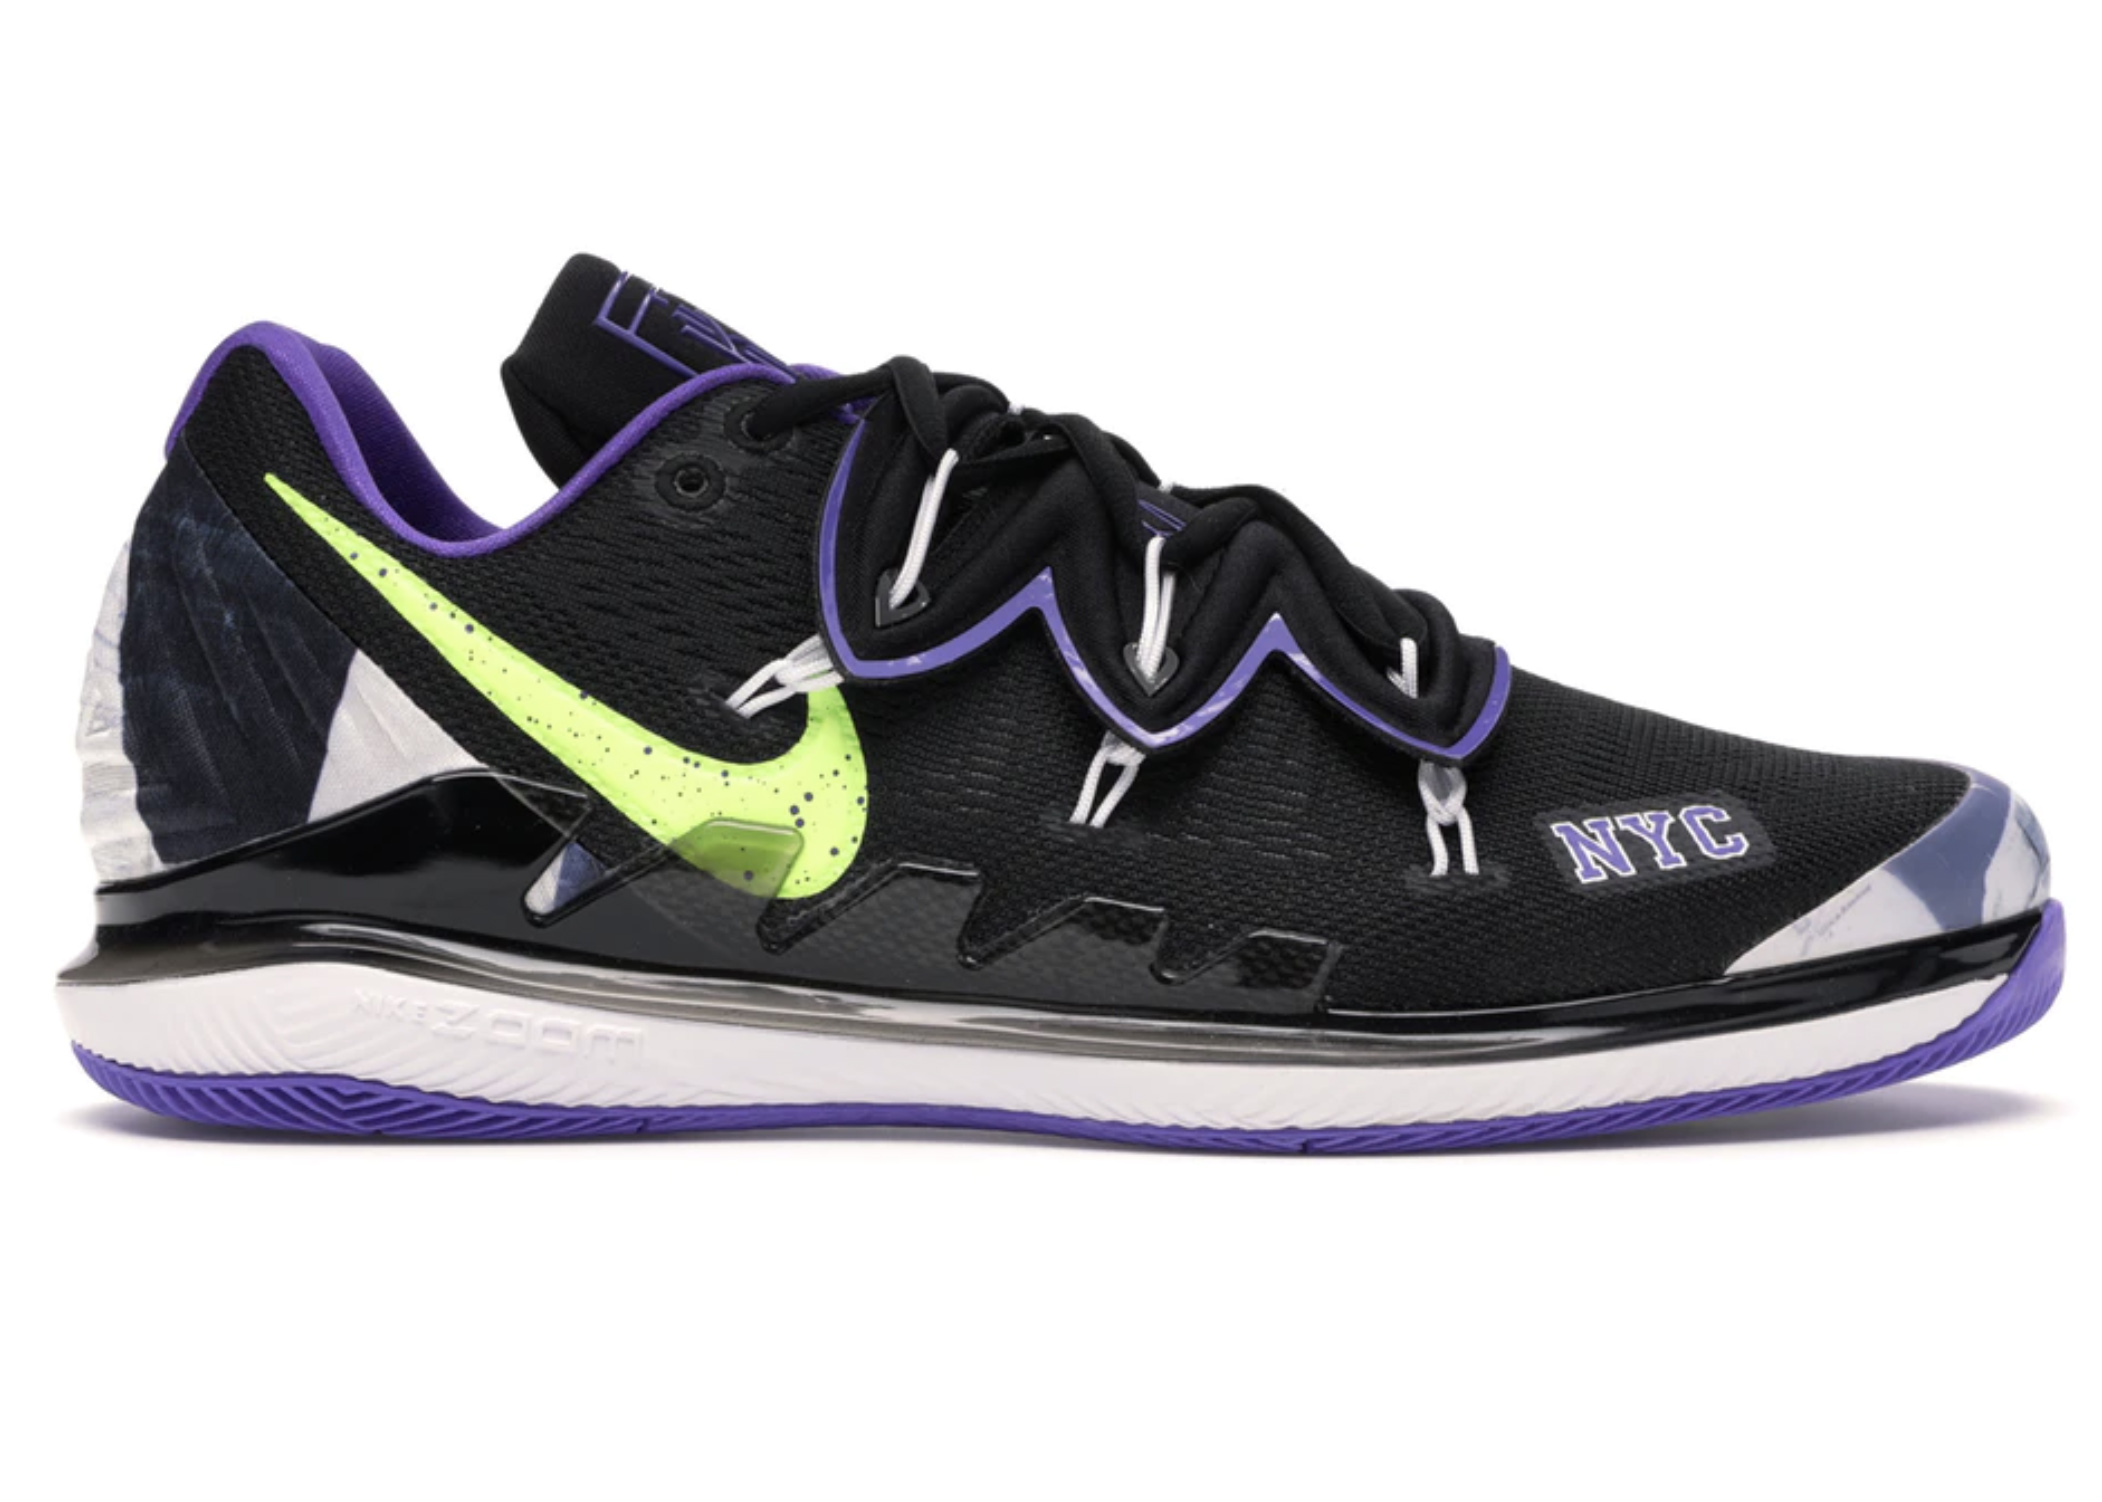 Nike Air Zoom Vapor X Kyrie 5 US Open